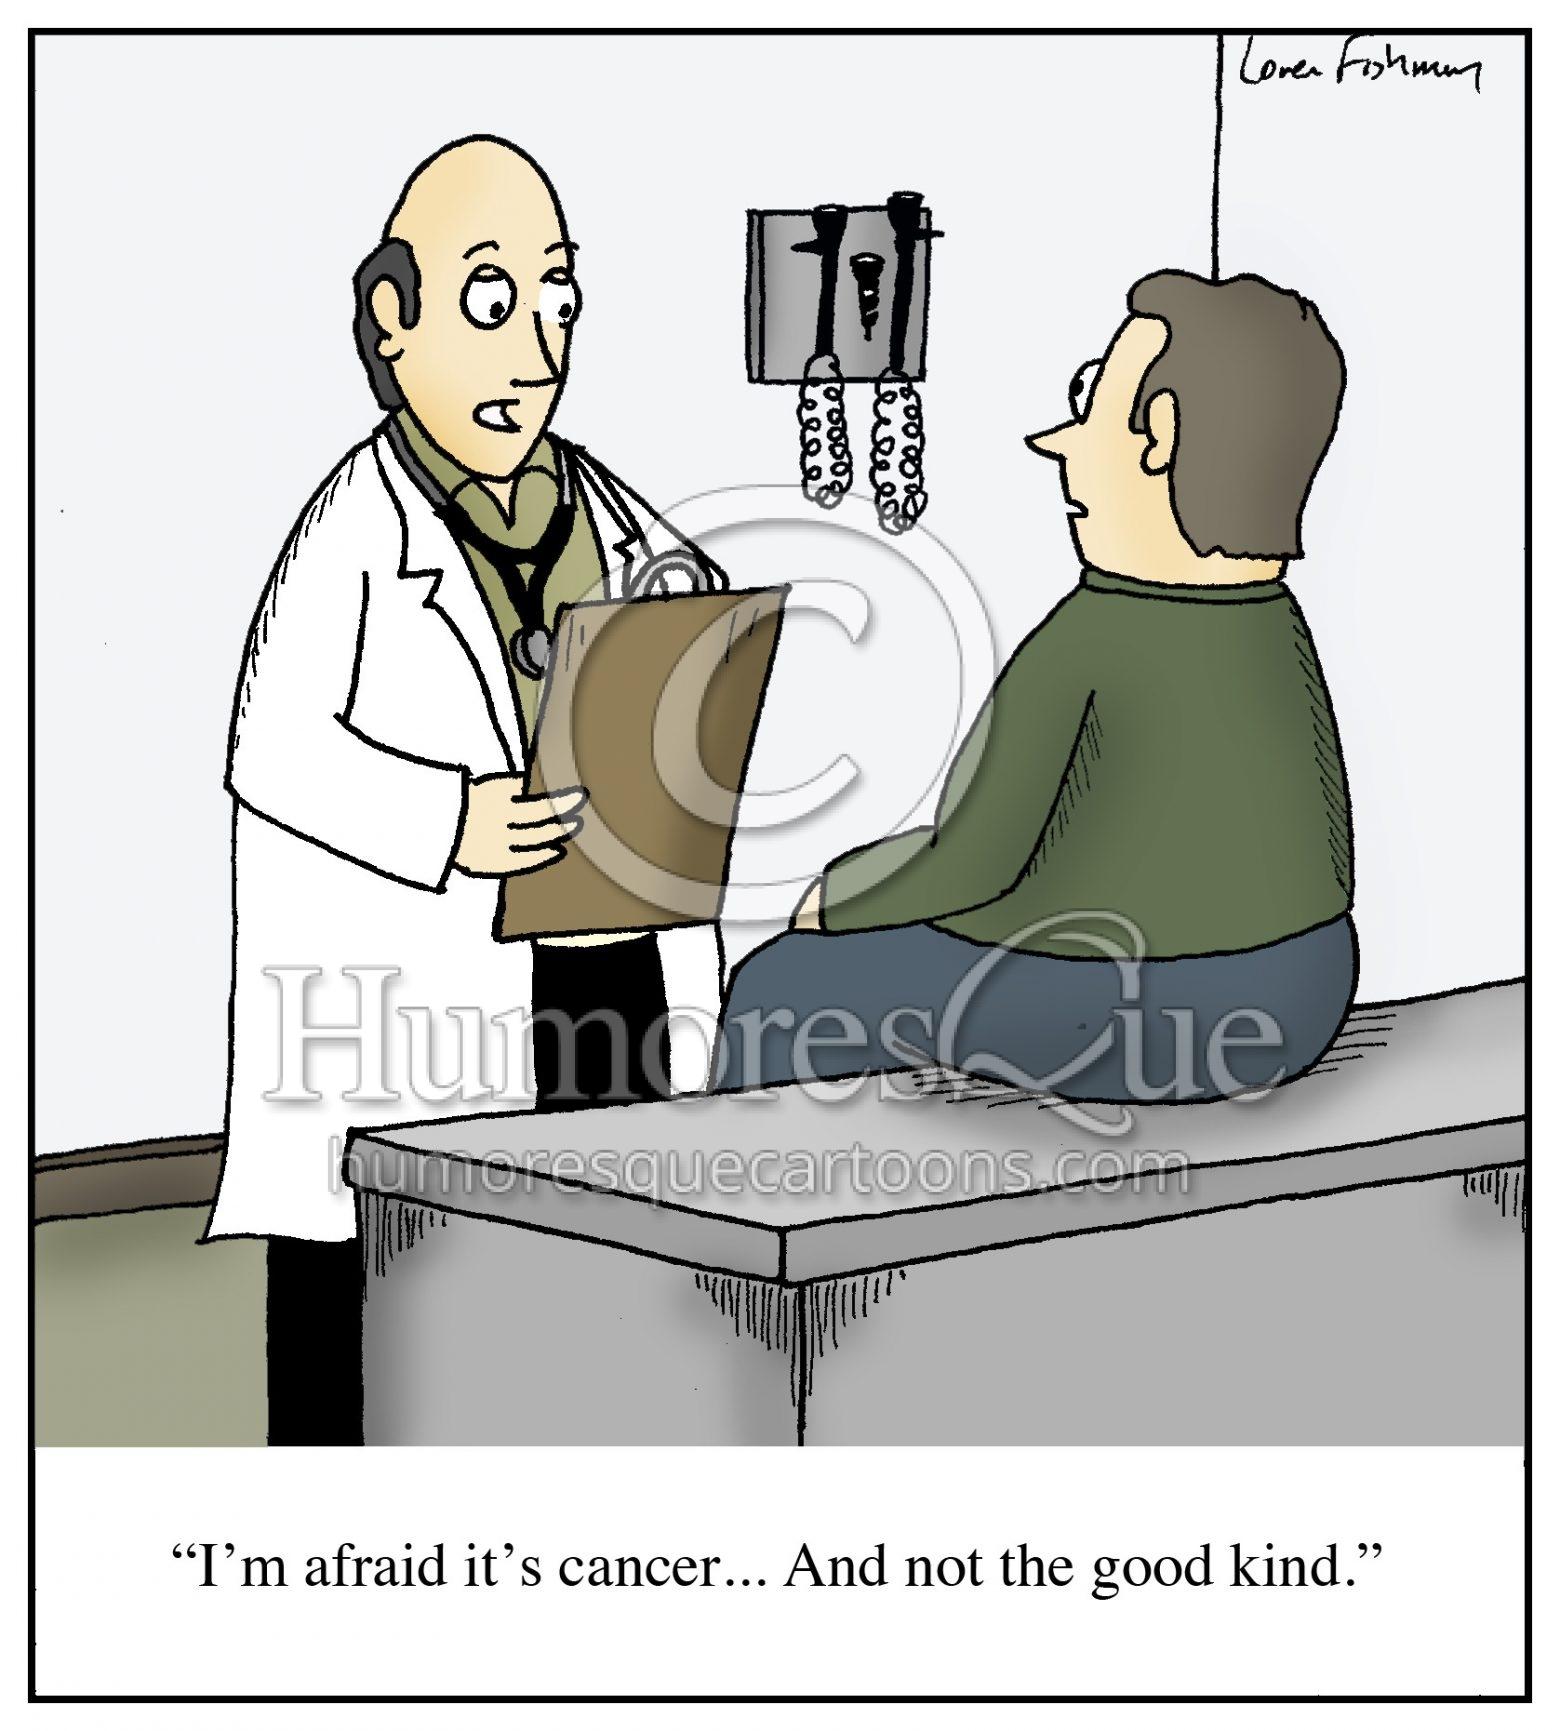 good kind of cancer oncology cartoon